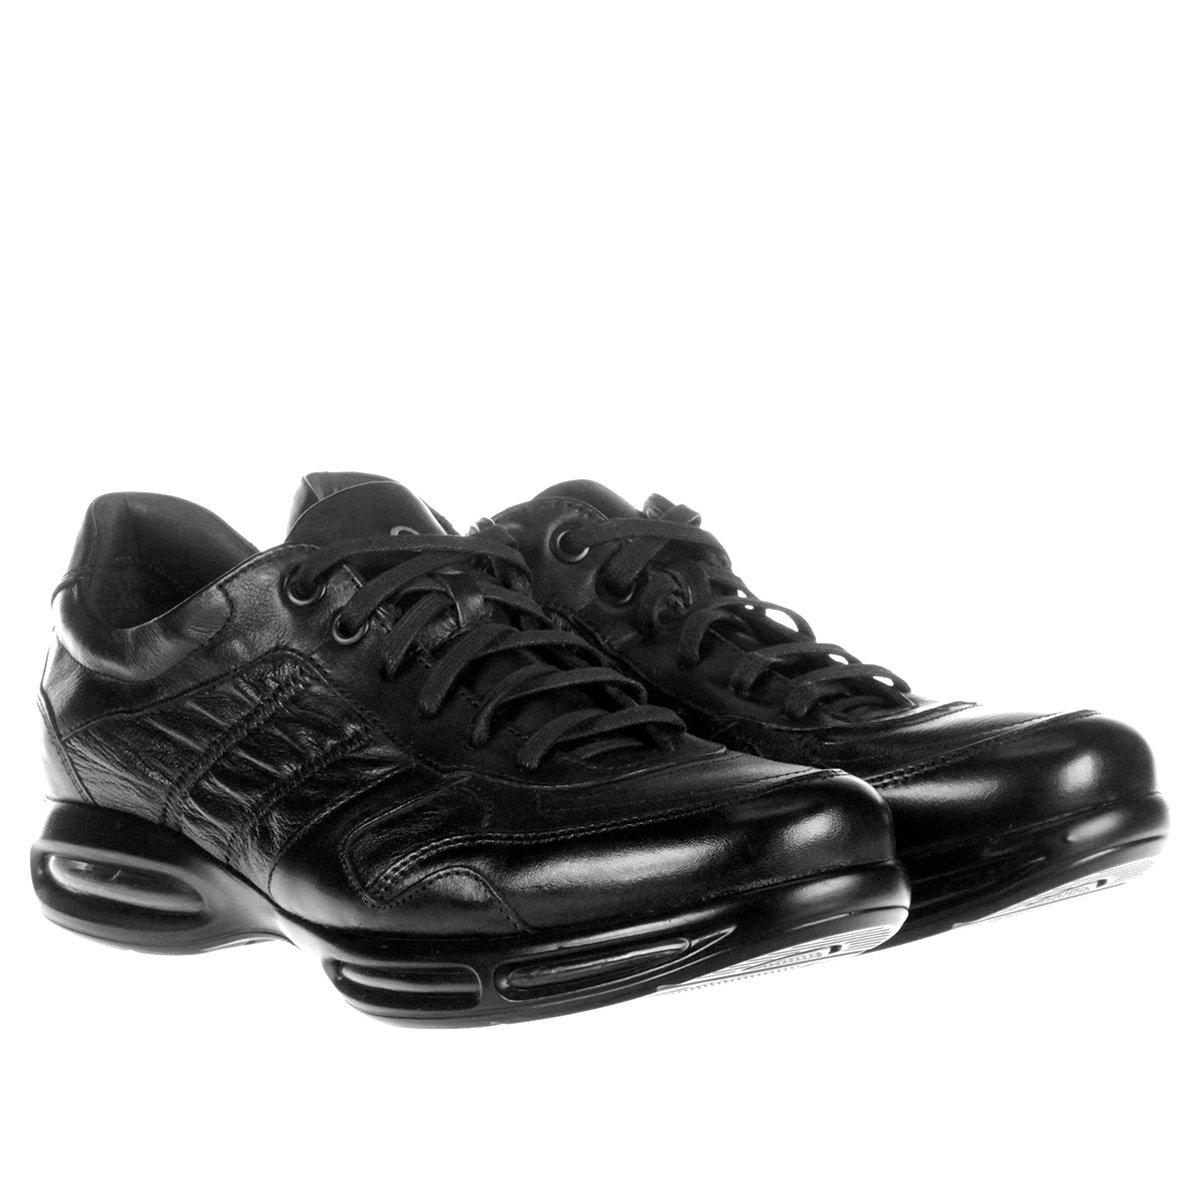 a3c7b041b Sapato Conforto e Calçados Masculinos | Zattini